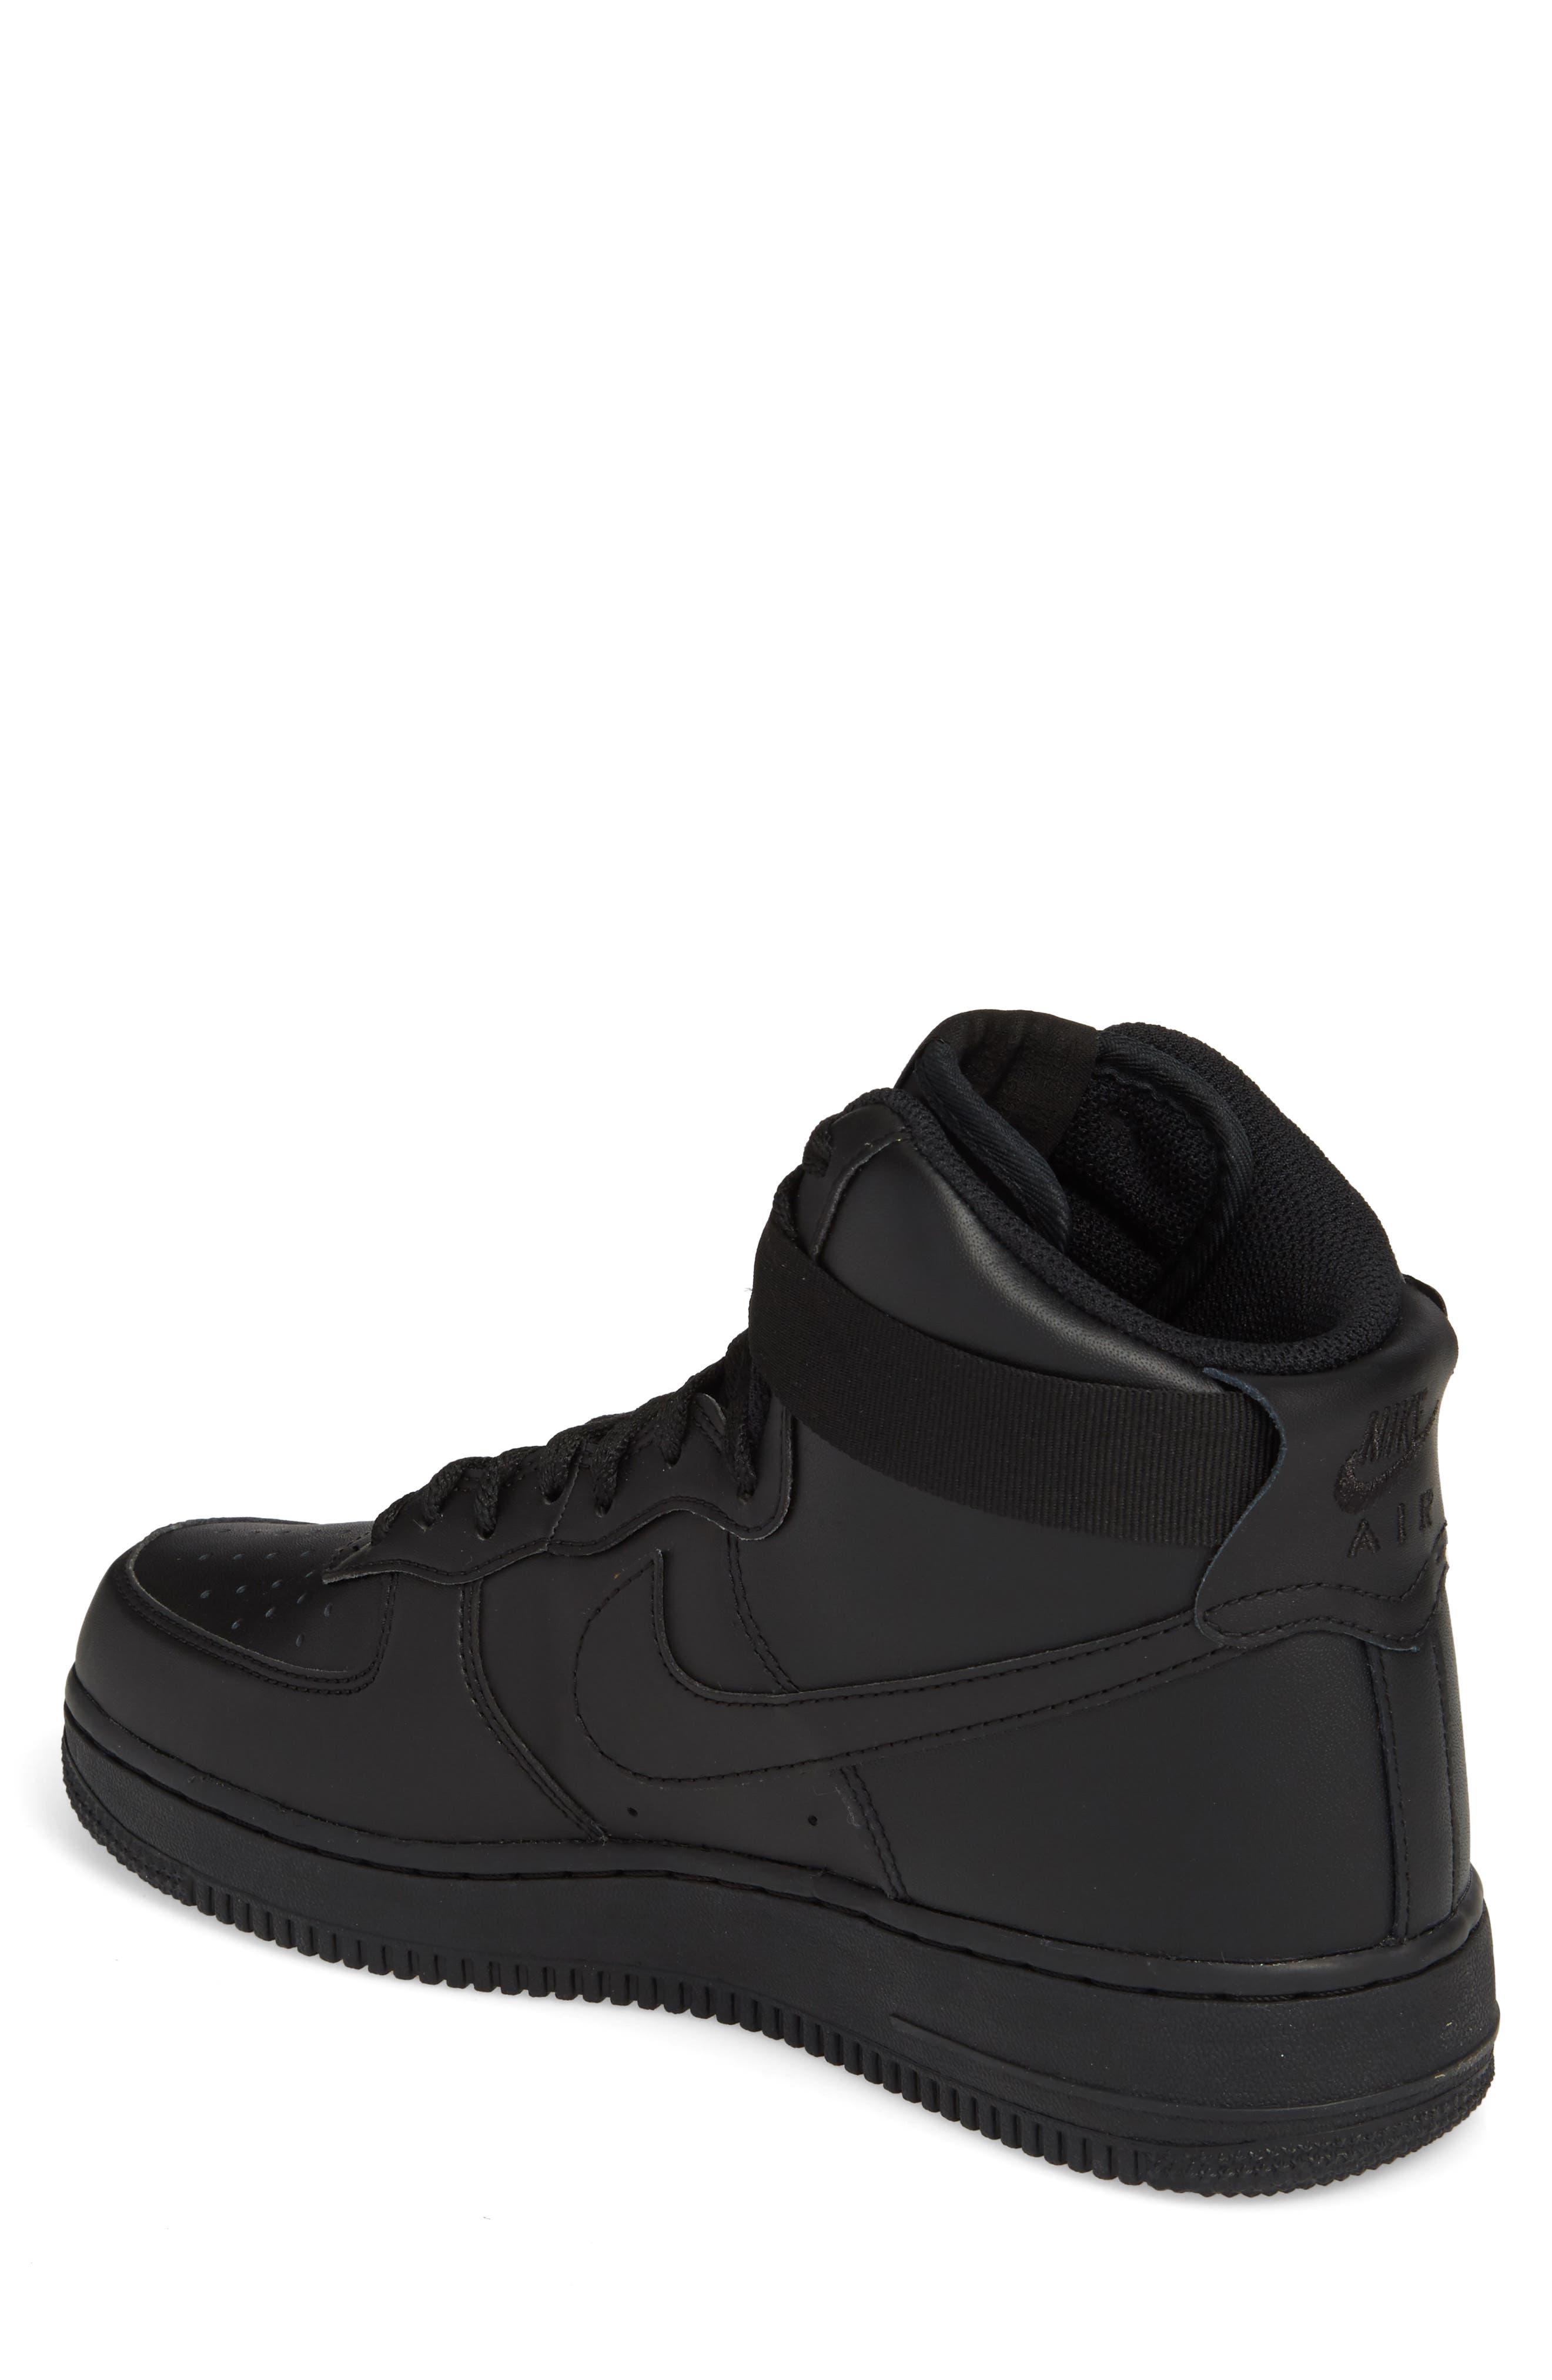 Air Force 1 High '07 Sneaker,                             Alternate thumbnail 2, color,                             Black/ Black